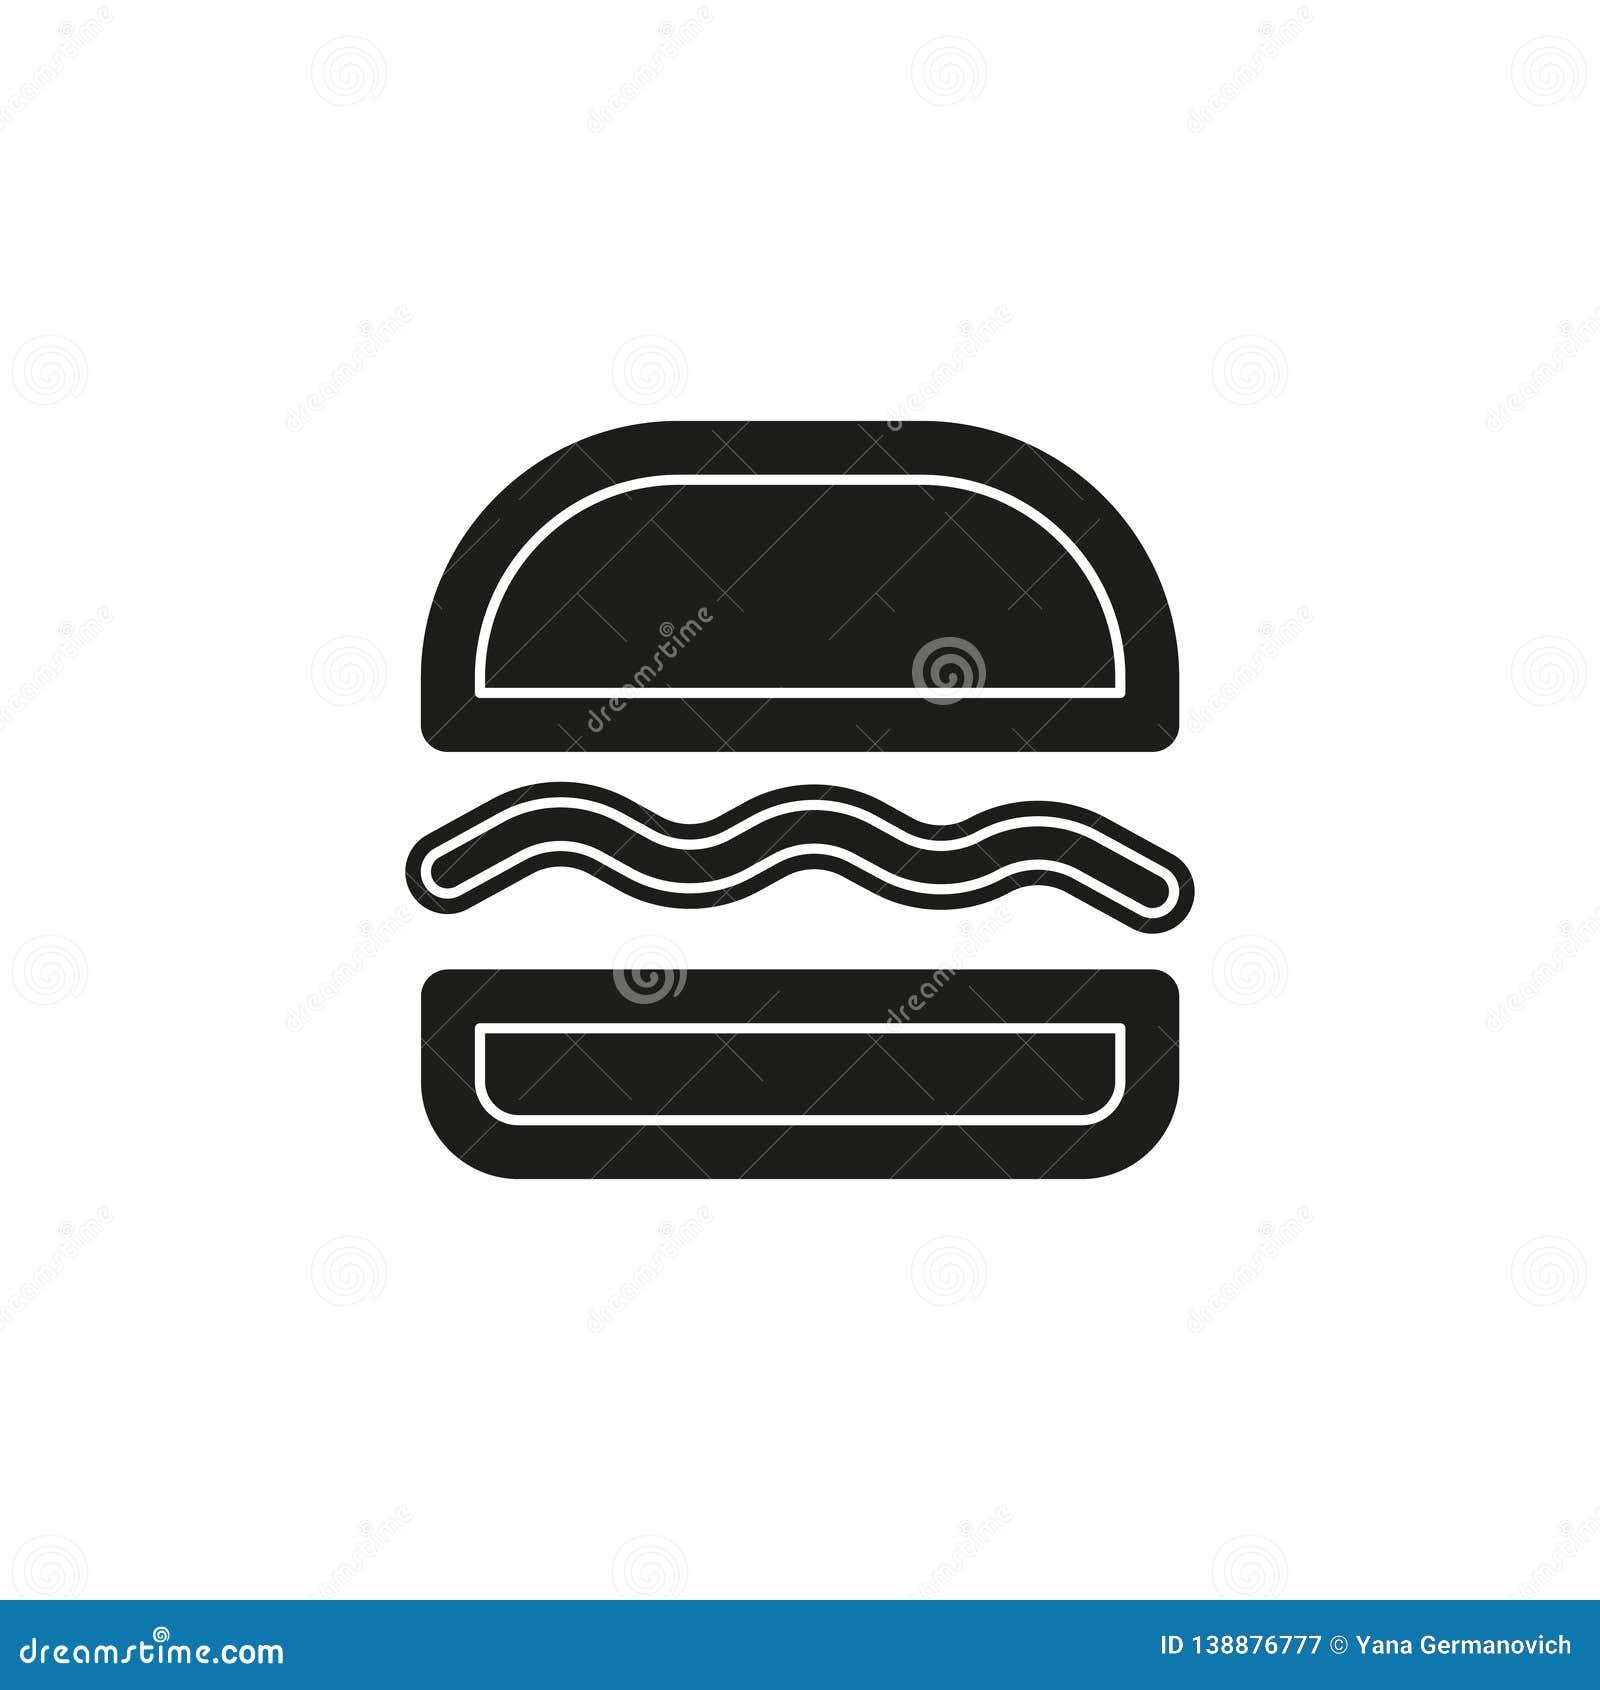 burger sandwich icon - fast food